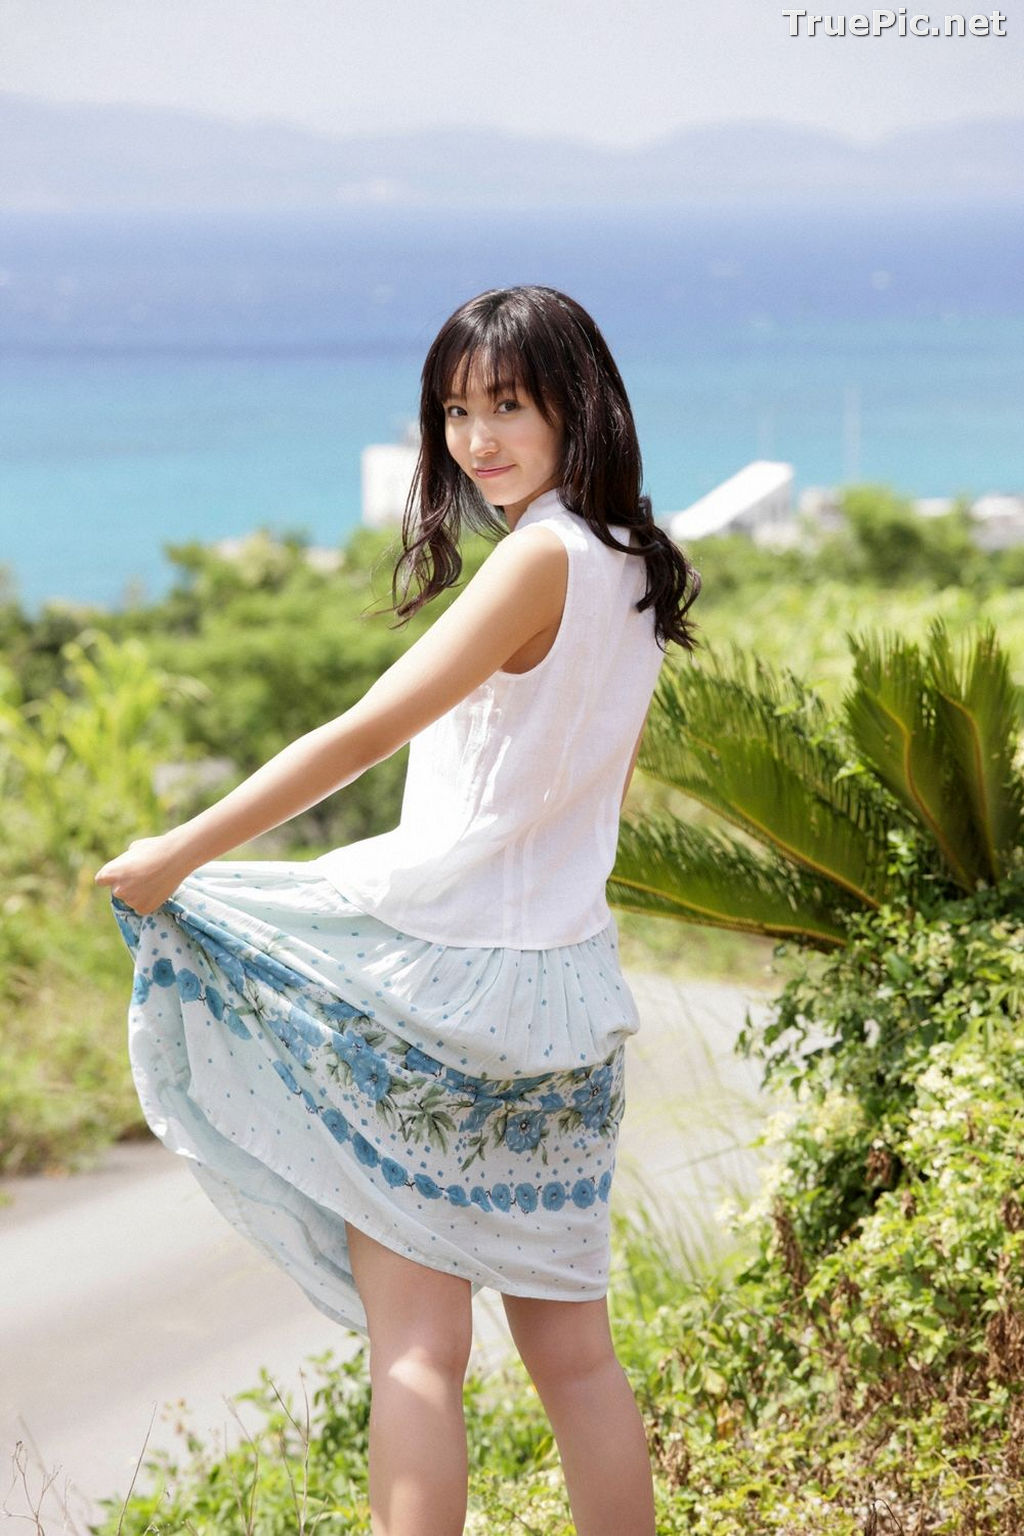 Image [YS Web] Vol.527 - Japanese Gravure Idol and Singer - Risa Yoshiki - TruePic.net - Picture-3